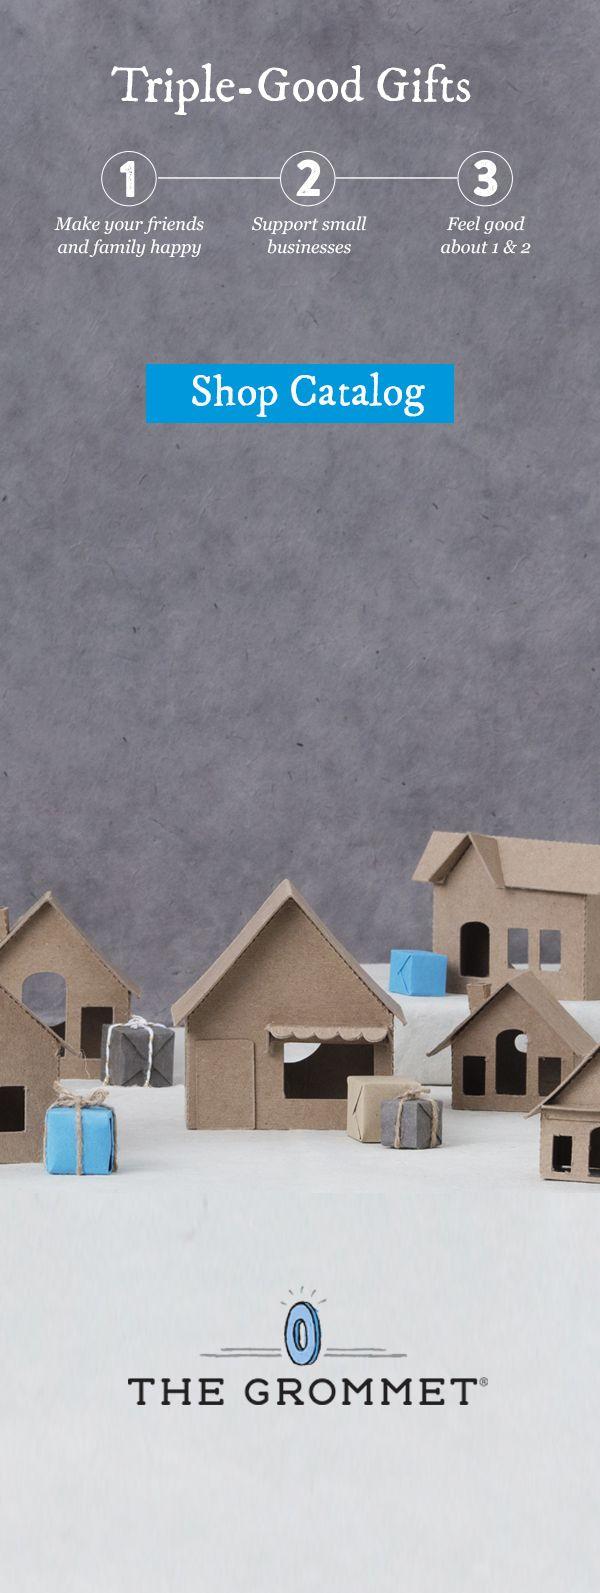 Paper/cardboard houses/village | for Christmastime: make Christmas village with gingerbread house, Santa's workshop, etc.